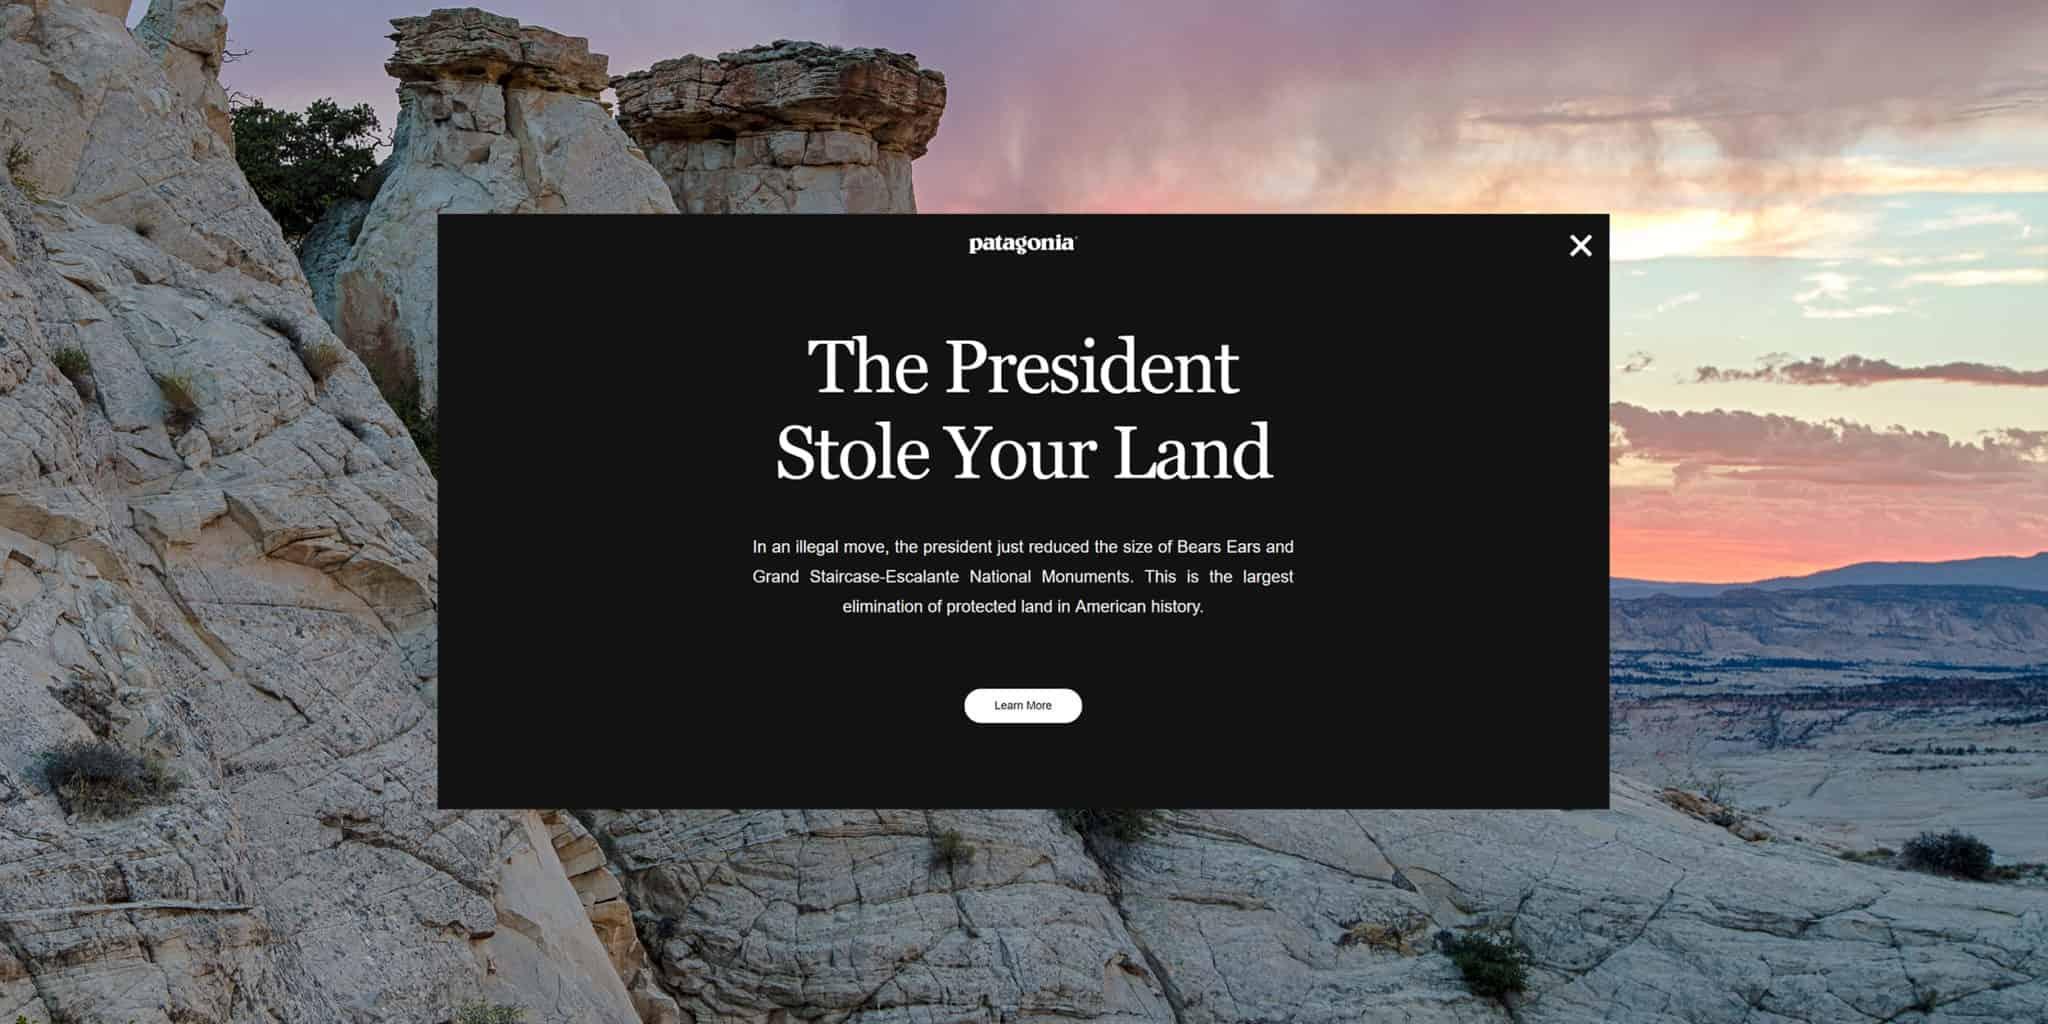 Brand Democracy แบรนด์ Patagonia ยื่นฟ้อง Trump เพราะหั่นป่าสงวนแห่งชาติ